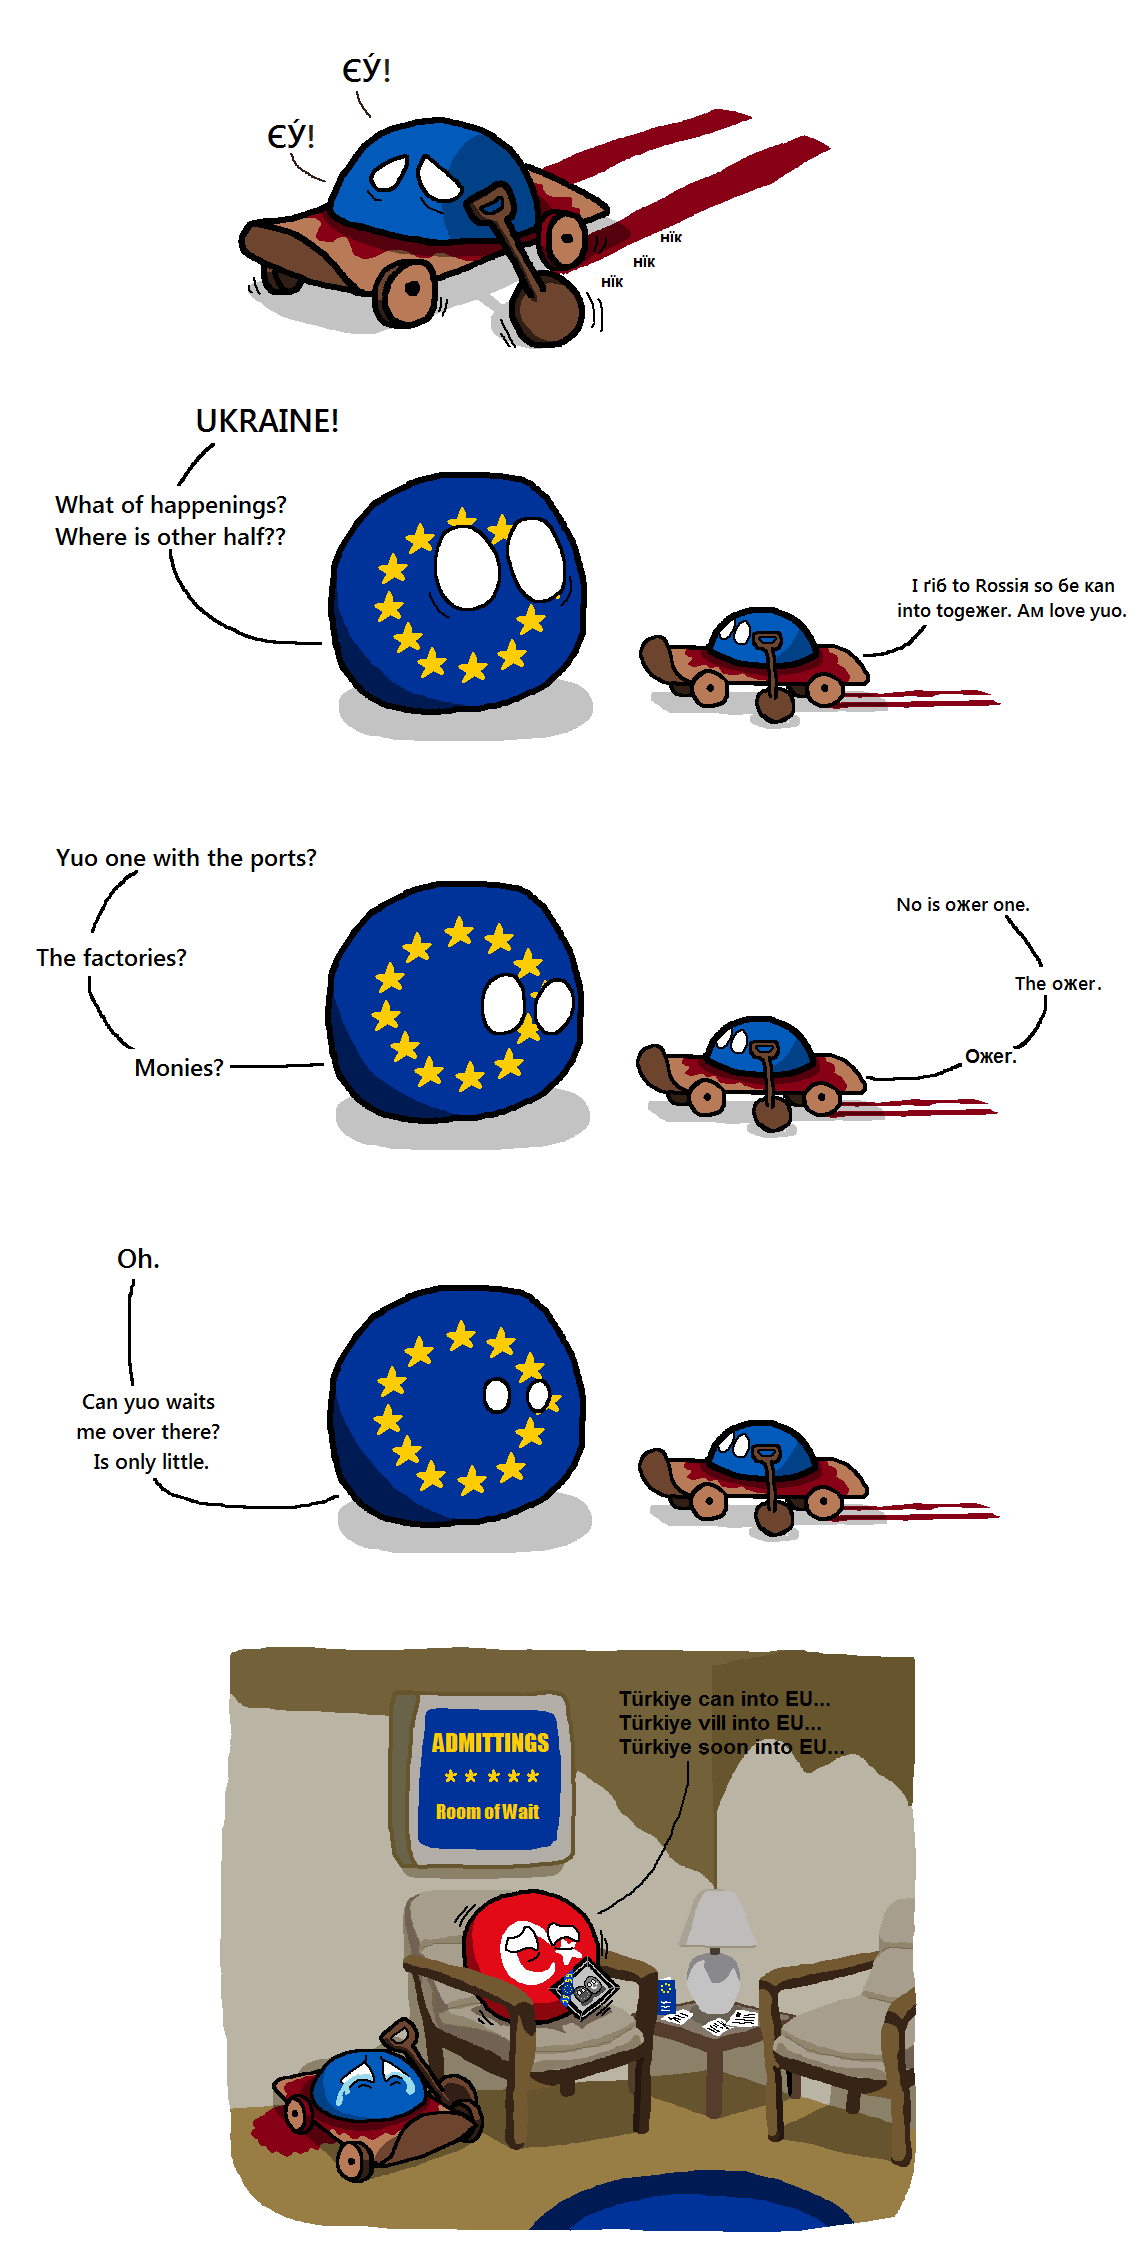 country-balls-ukraine-s-great-sacrifice